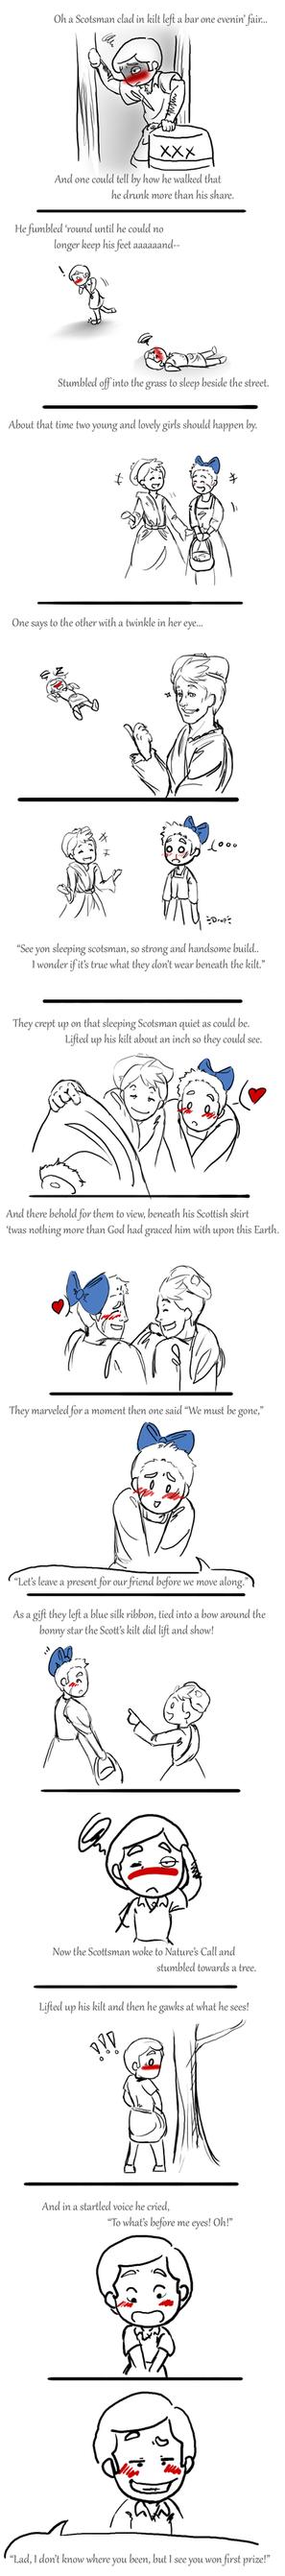 Scotsman's kilt by Free-Falling